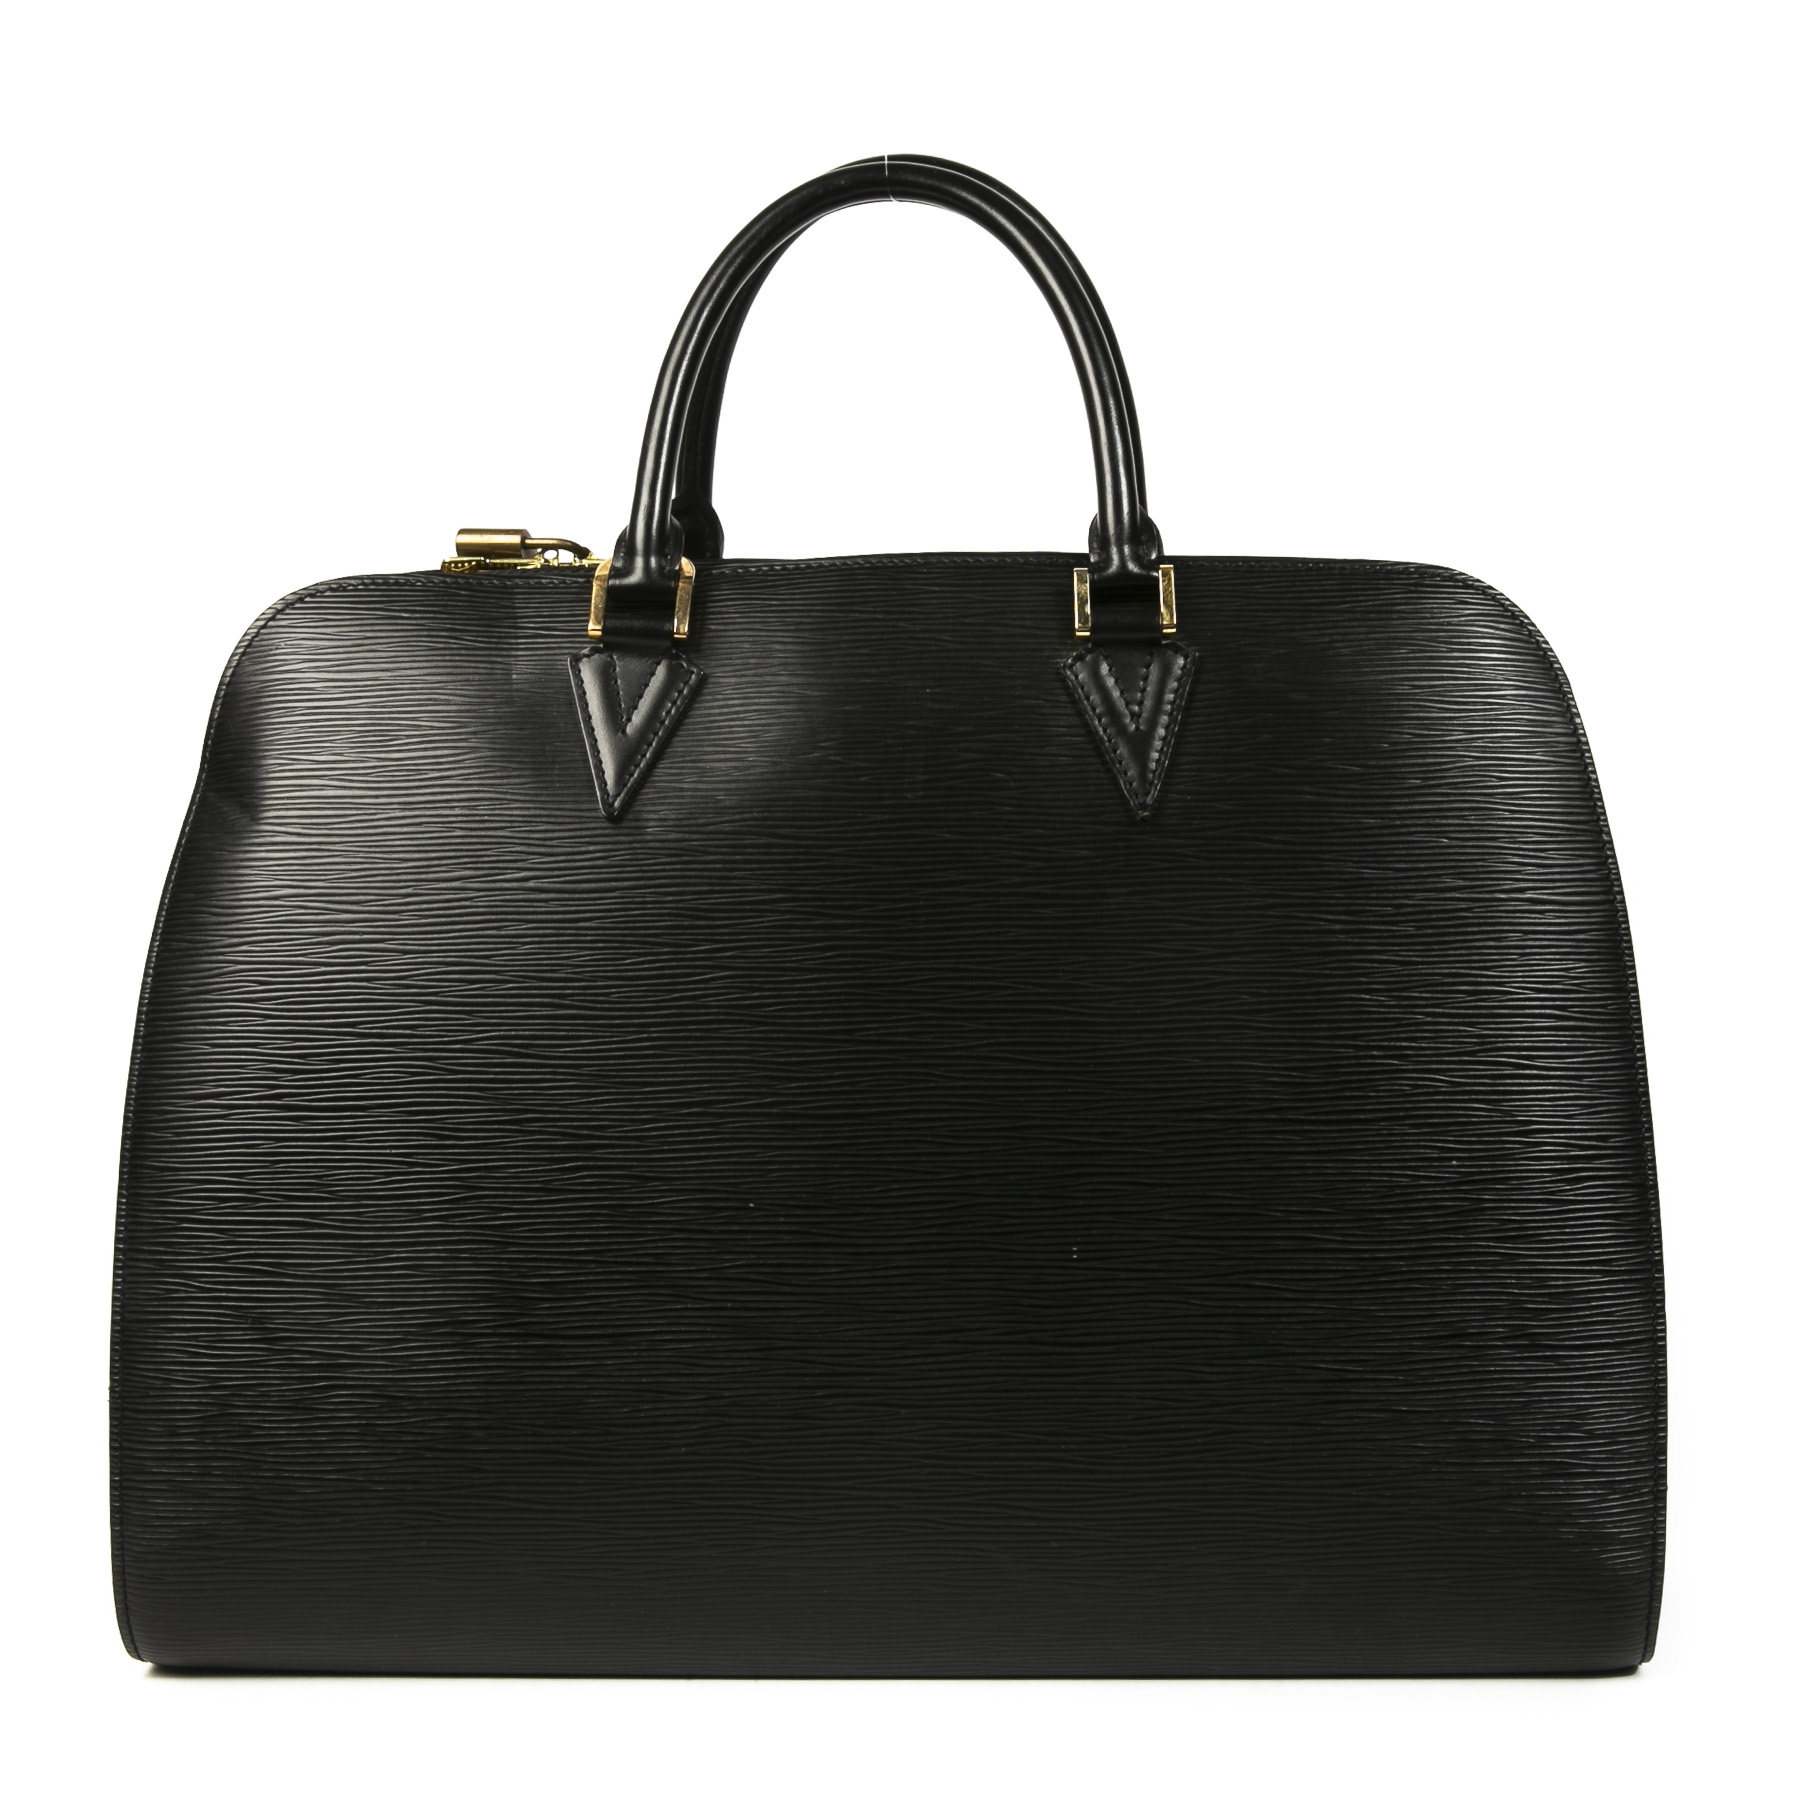 Authentieke tweedehands vintage Louis Vuitton Black Epi Top Handle Bag koop online webshop LabelLOV